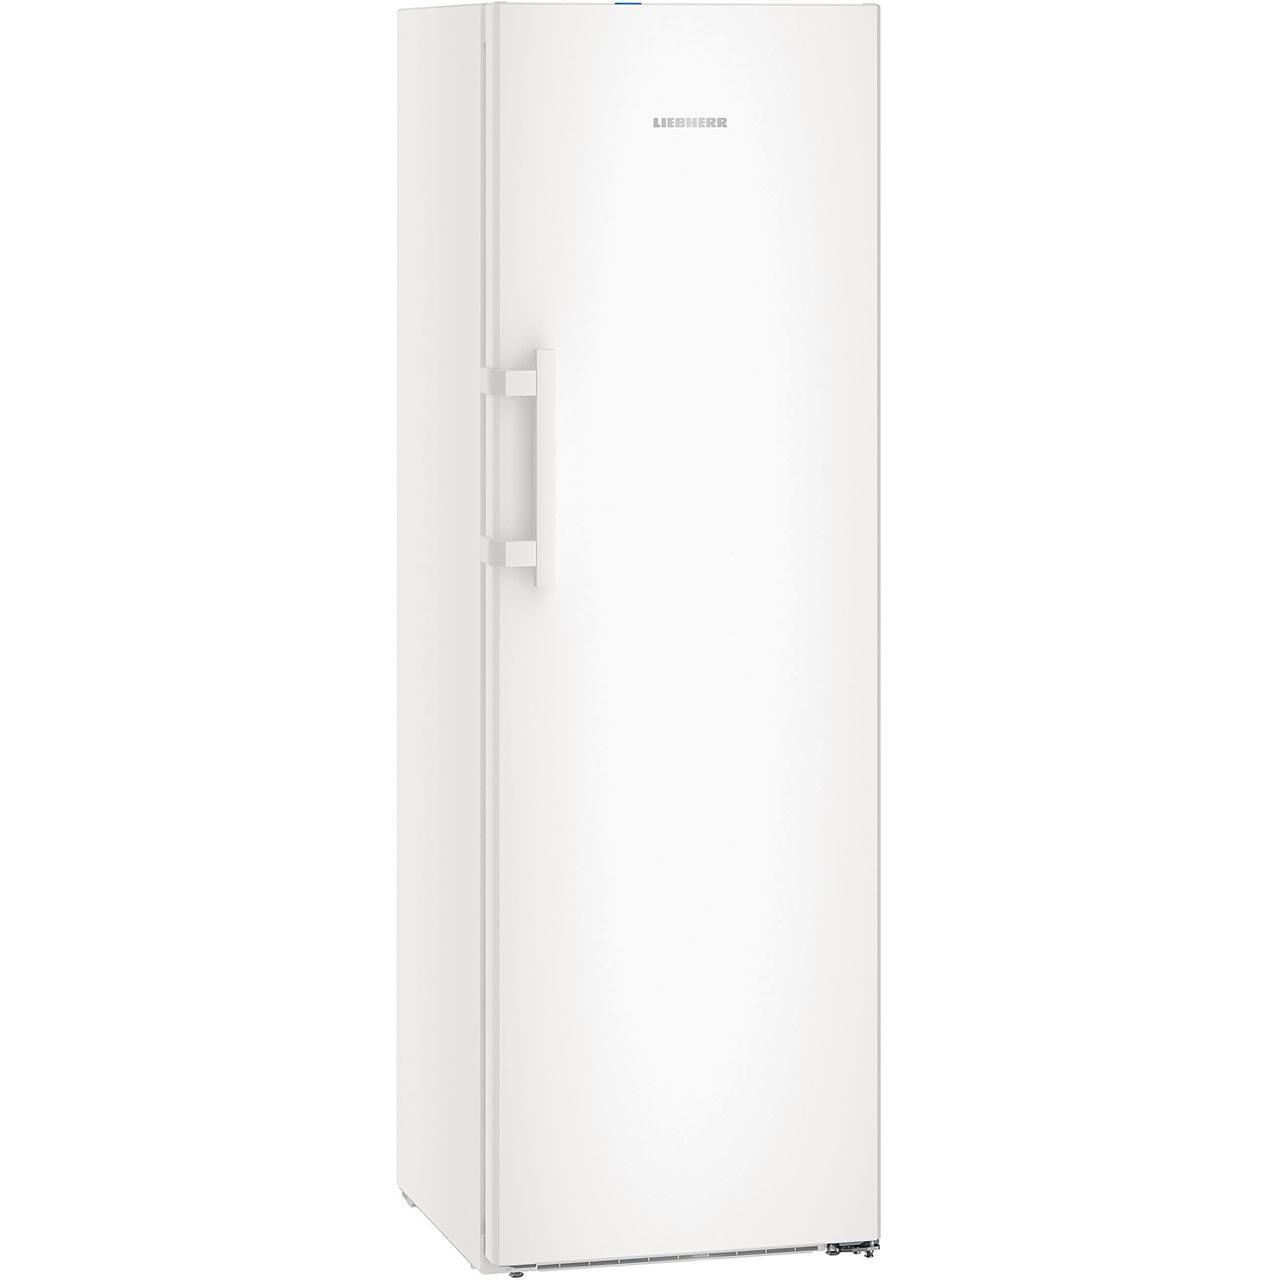 Liebherr GNP4355 Frost Free Upright Freezer review